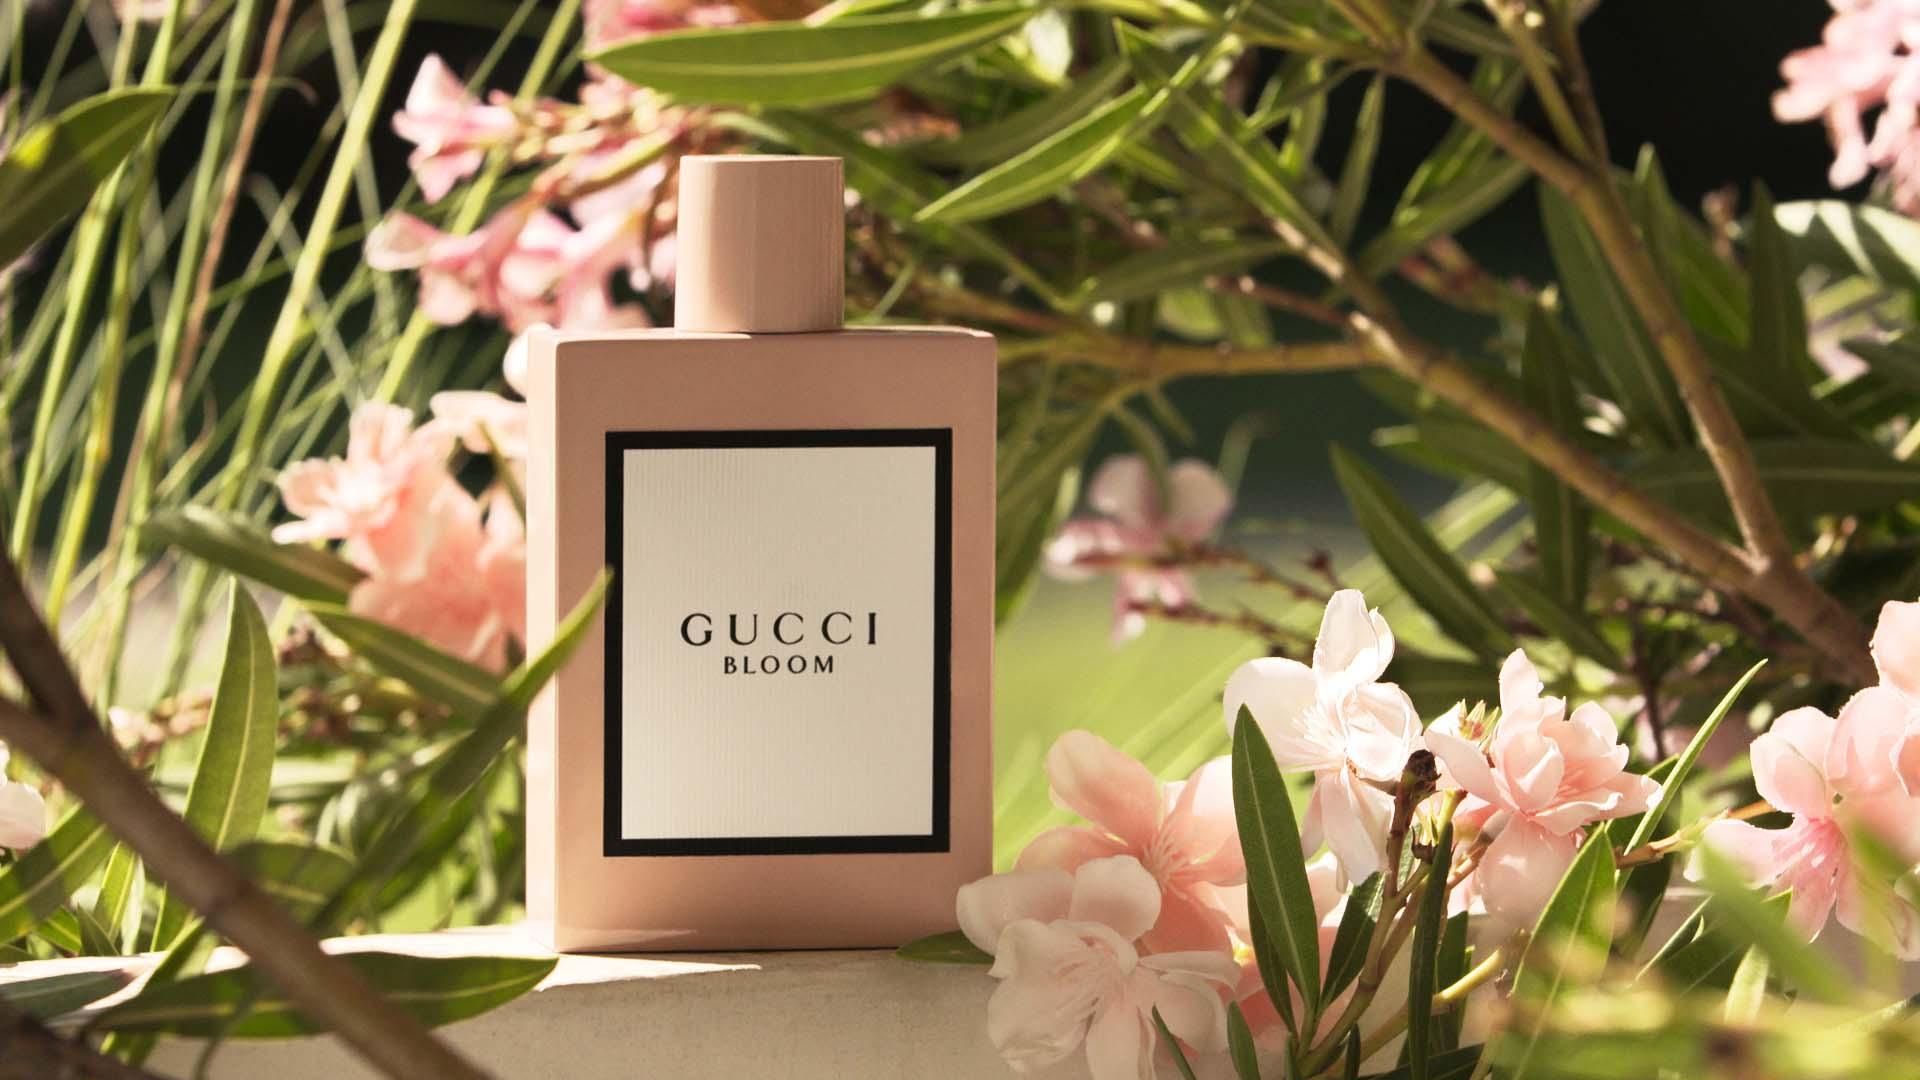 Alberto Morillas, Alessandro Michele, Beauty, Fashion, Featured, Fragrance, Gucci, Gucci Bloom, Perfume, Perfumery, Scent, Style